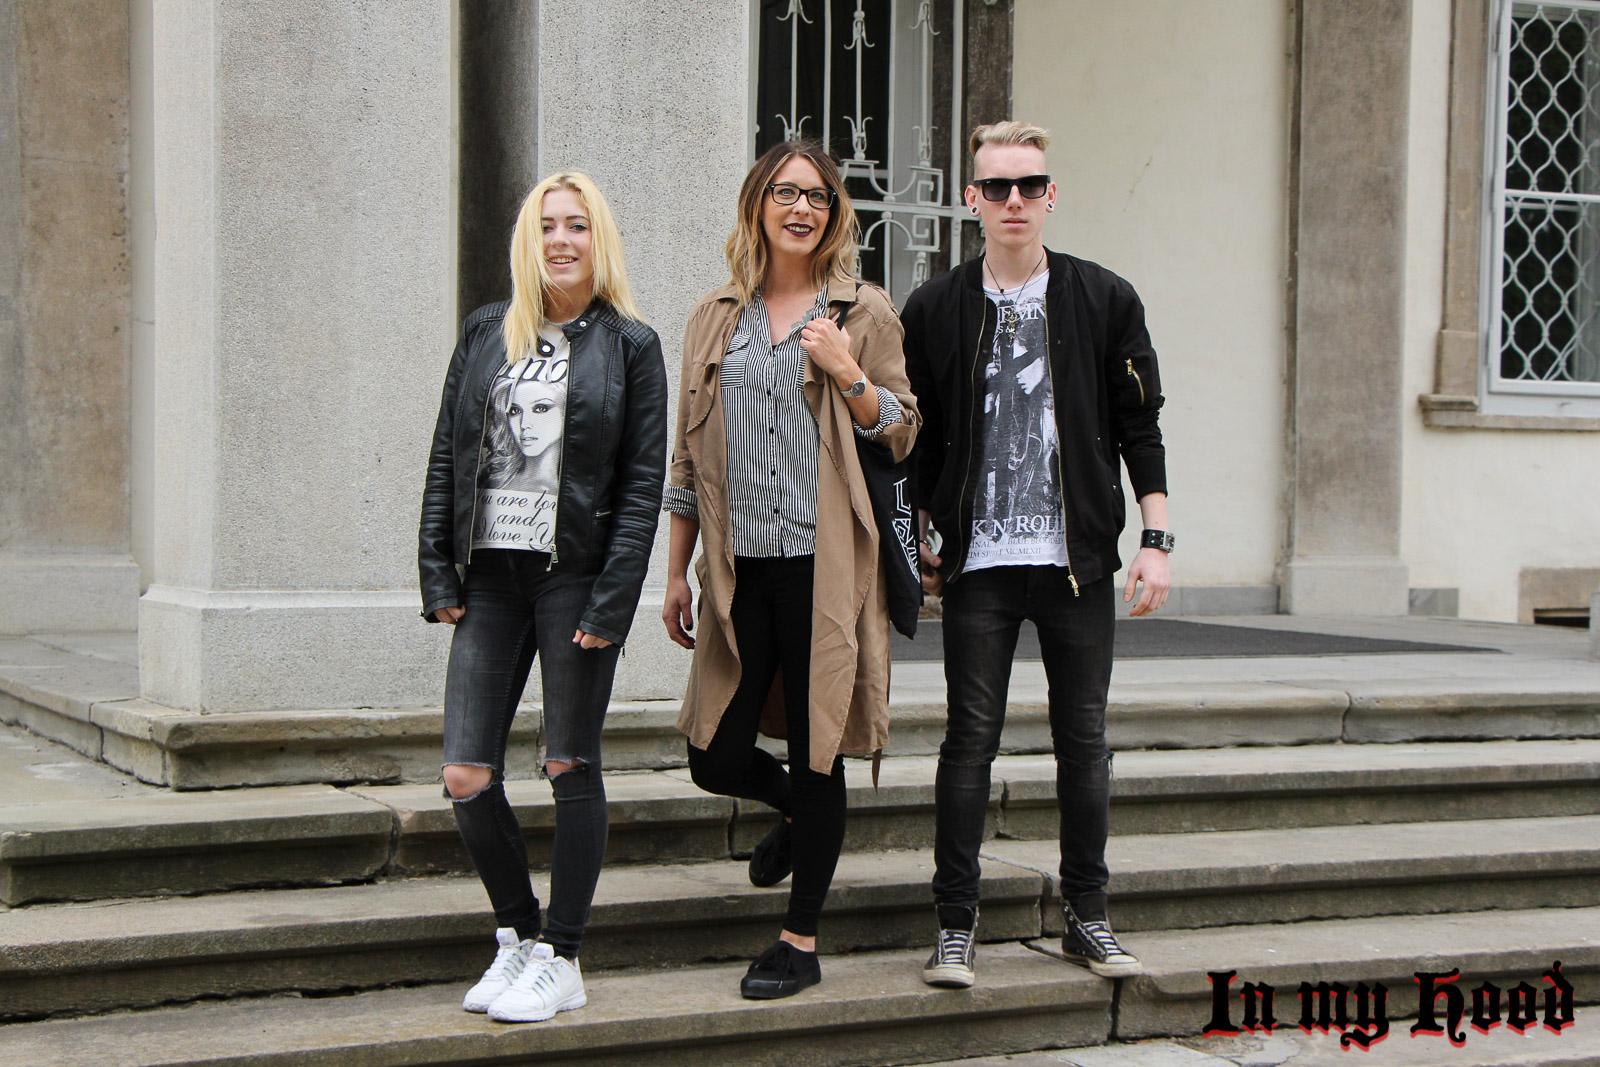 MY STYLE Bomberjacke und Knee-Cut Jeans, In my Hood, Tobias, Austria, Steiermark, Graz, Grazer Blogger, OOTD, WIW, What I wore, Instastyle, Style is what , Streetstyle, Fashionaddict, Mensfashion, Mensstyle, Men with style, Fashiongoals, Fashionkilla, styled, Styleguide, Fashionblogger, Styleblogger, Lifestyleblog, Lifestyleblogger, Bloggerstyle, Bomberjacke, Converse, Knee-Cut Jeans, Ray Ban, Love, Liebe, Freundin, Nicole, Grazermadl